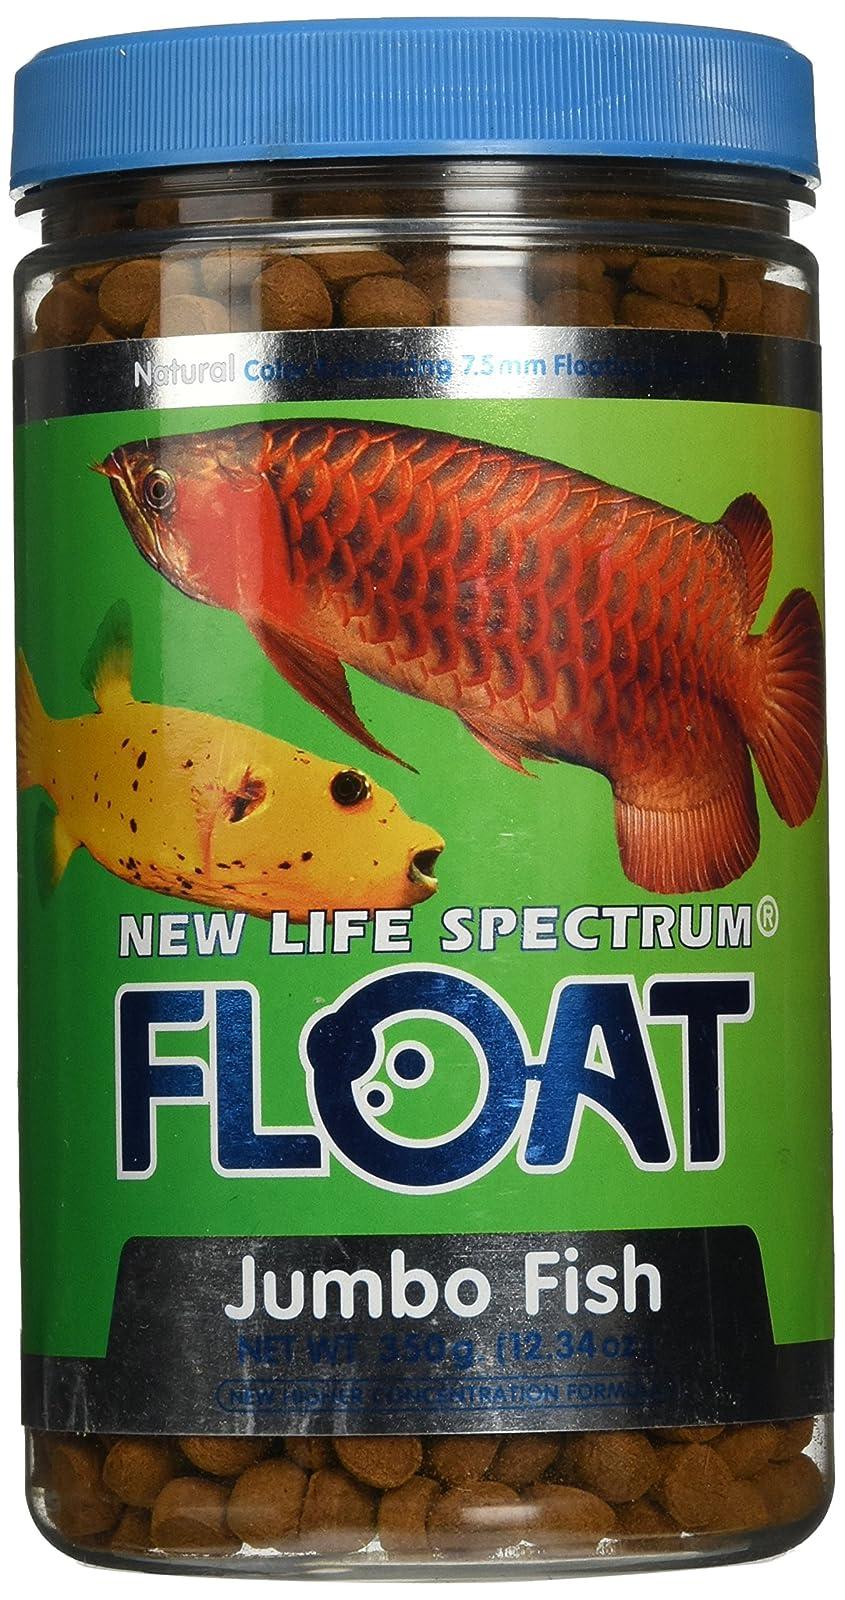 New Life Spectrum 350G/7.5Mm Food Jumbo 64674375 - 1